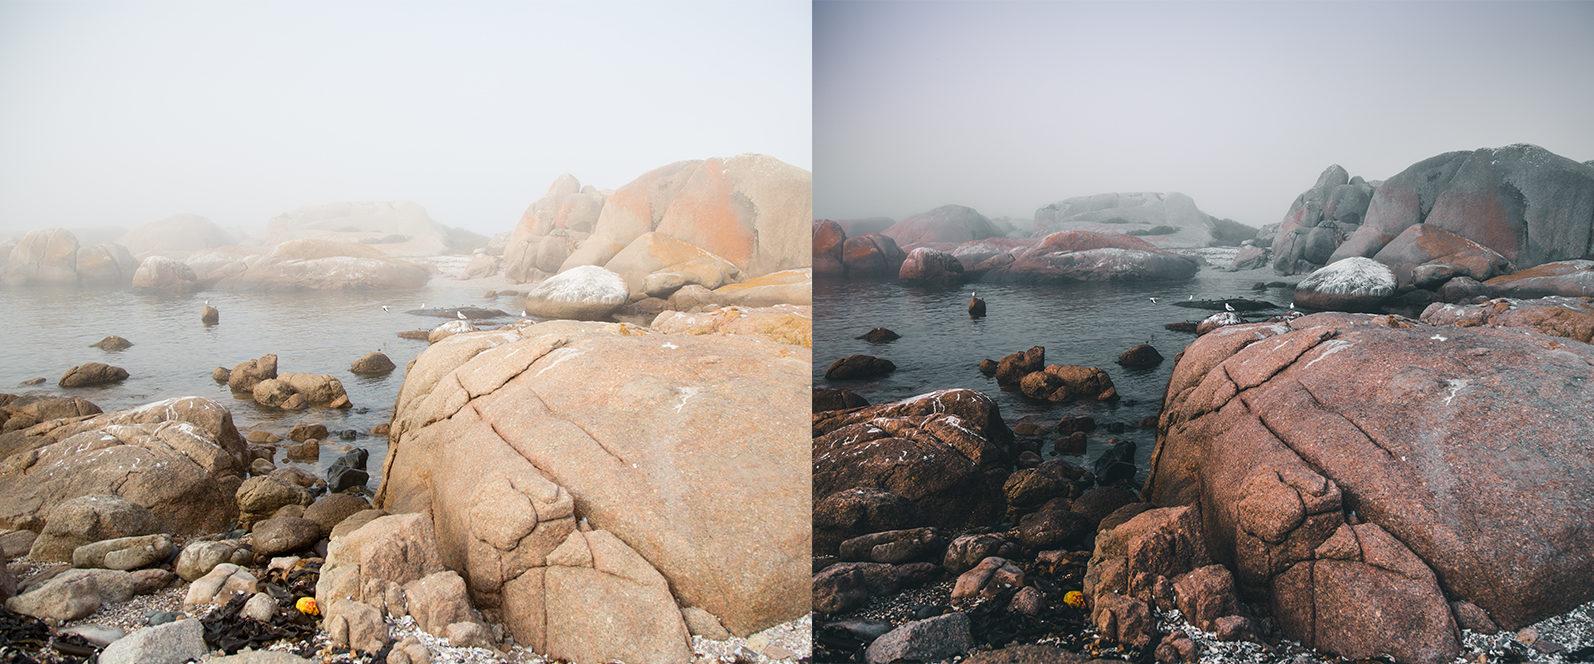 12 x Lightroom Presets, Cape Columbine, Beach and Ocean Presets, Seascape Presets - 3 Cape Columbine2 -